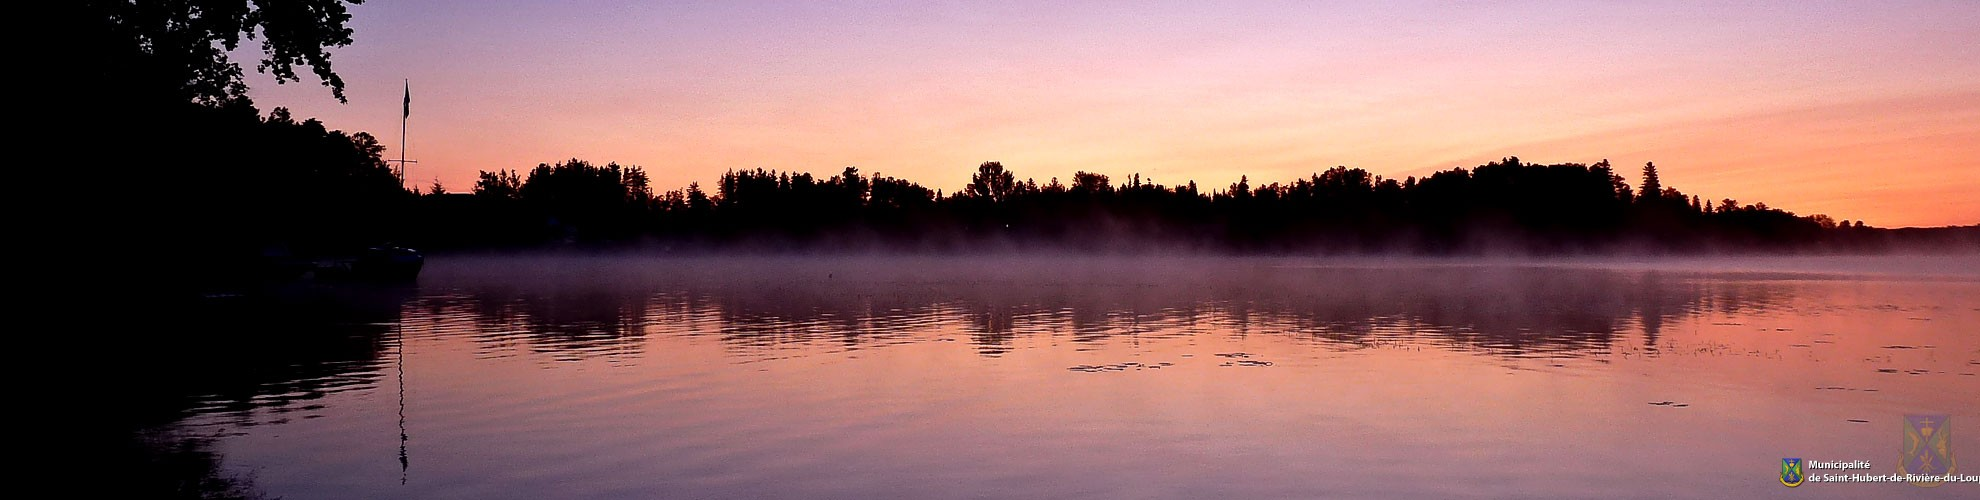 Hero - Lac dans la brume